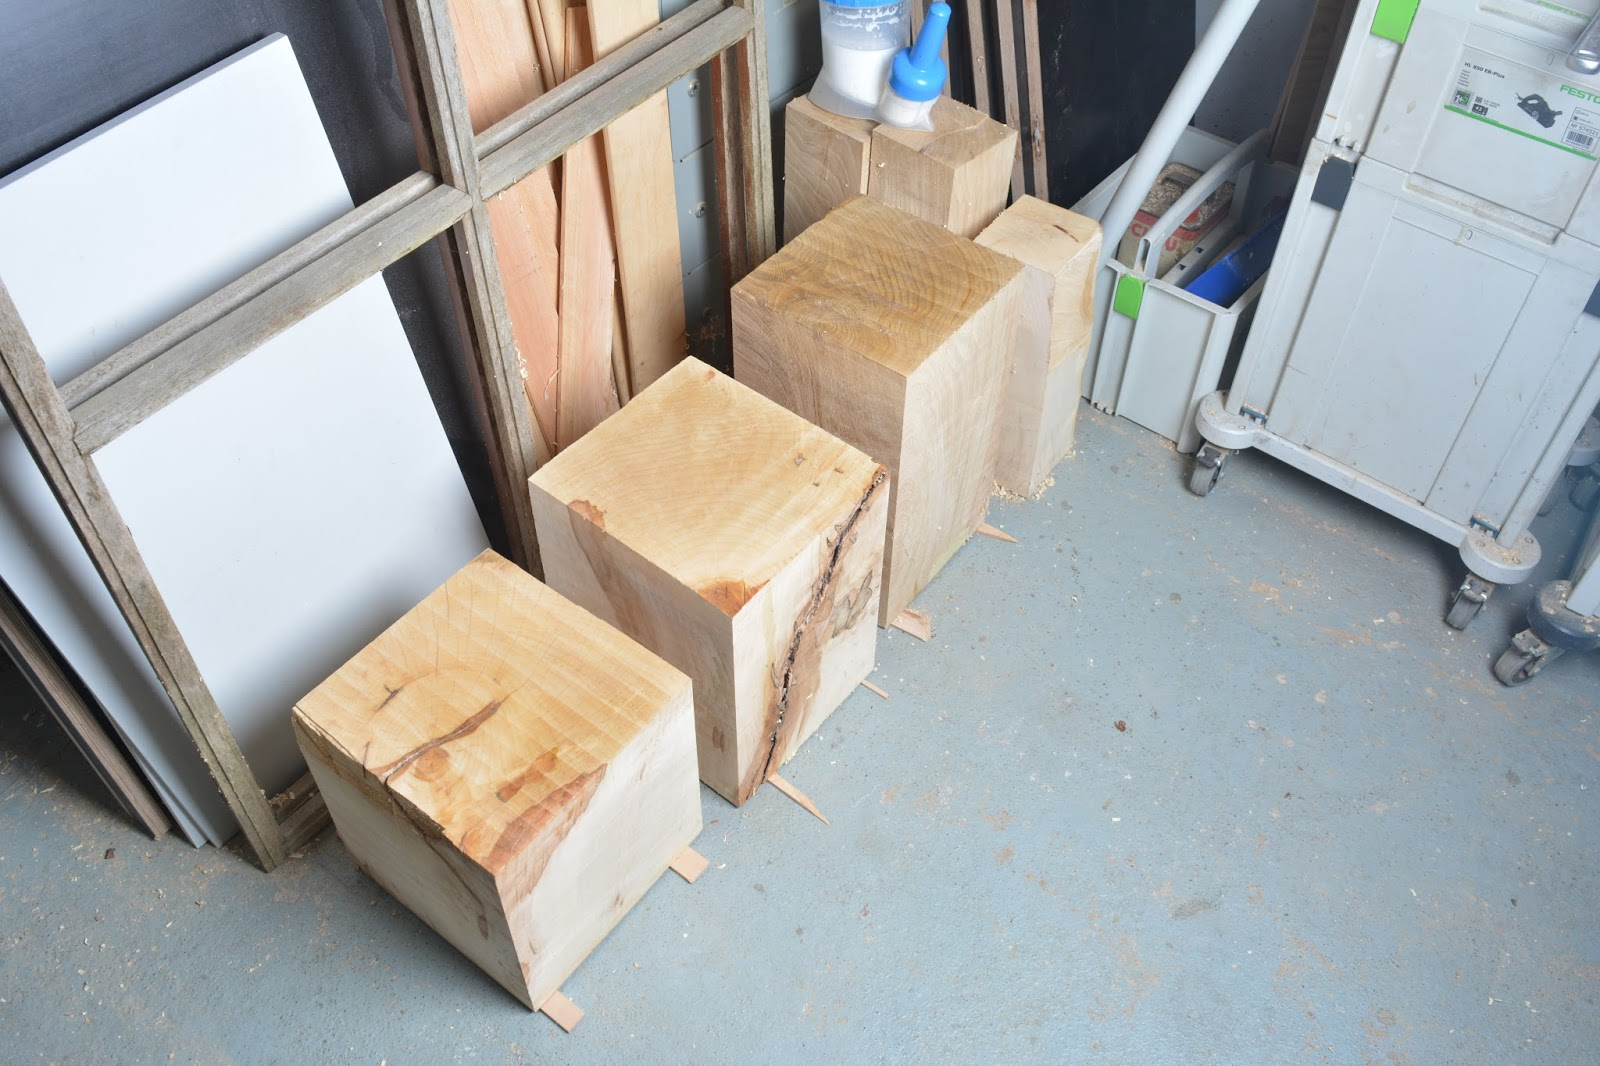 Holz Trocknen Ohne Risse holzprojekte september 2015